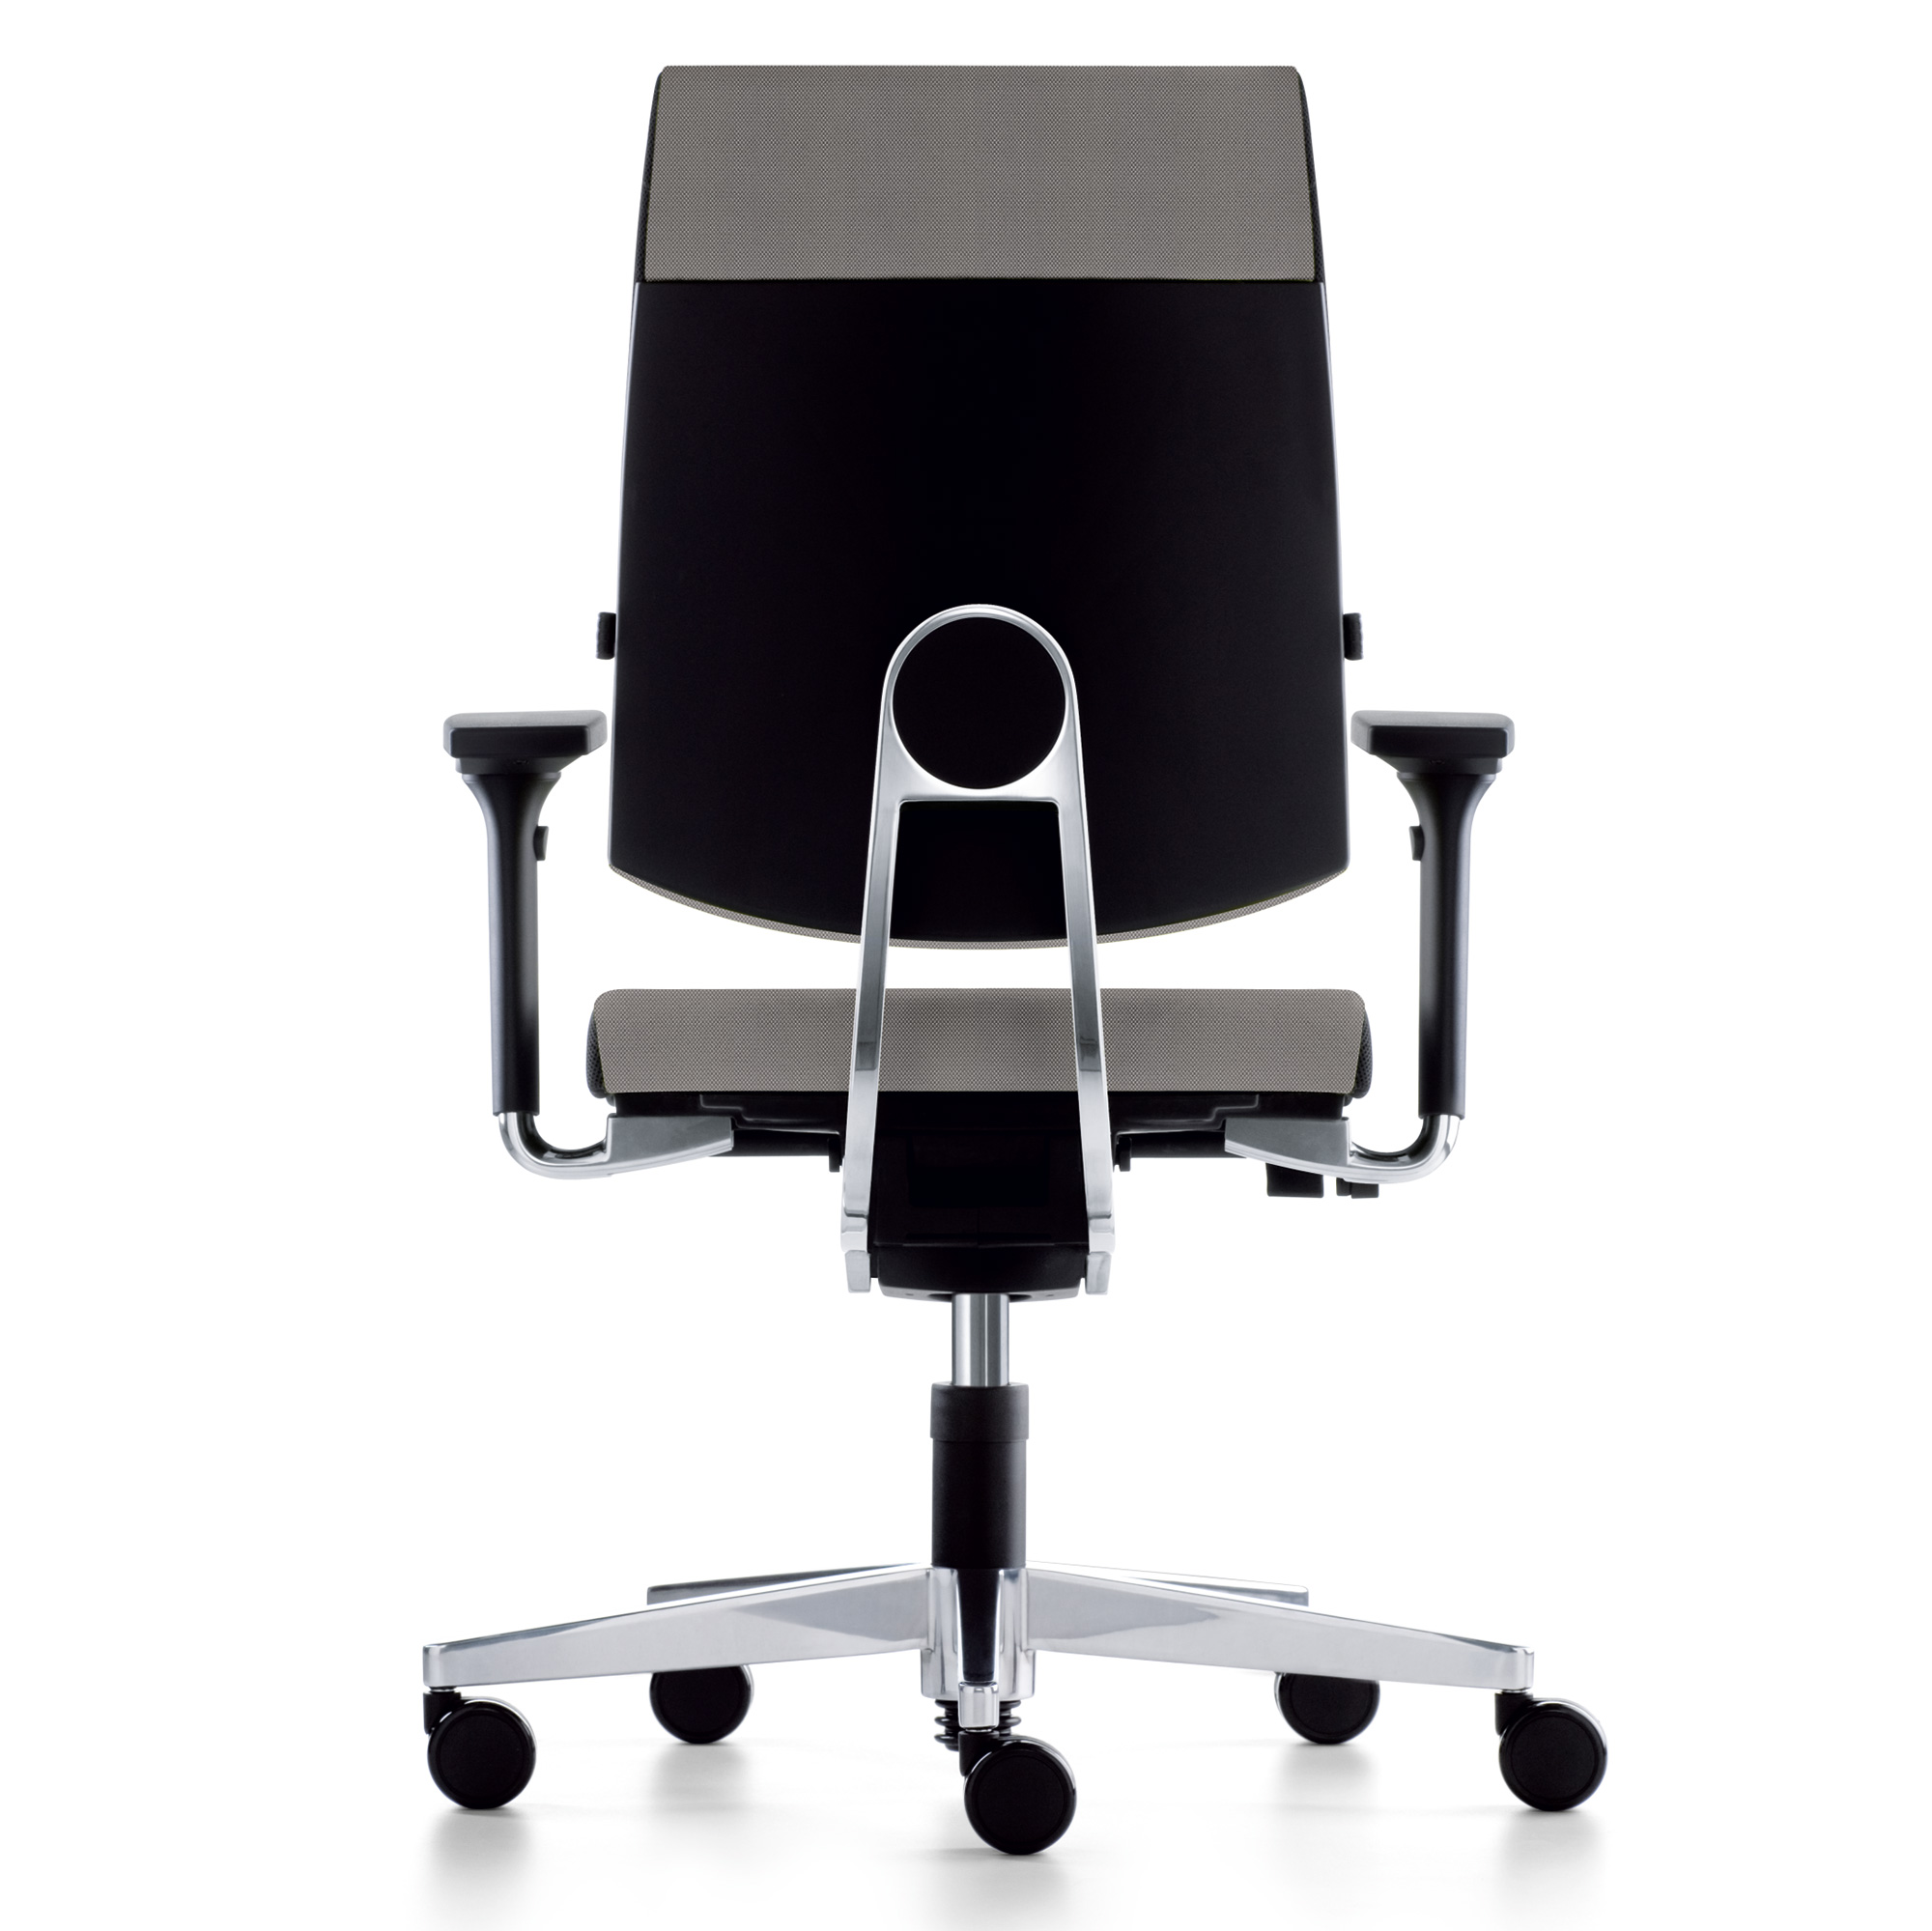 Sedus BLACK DOT Arbeitsstuhl BD-103 mit hoher Rückenlehne, gepolstert